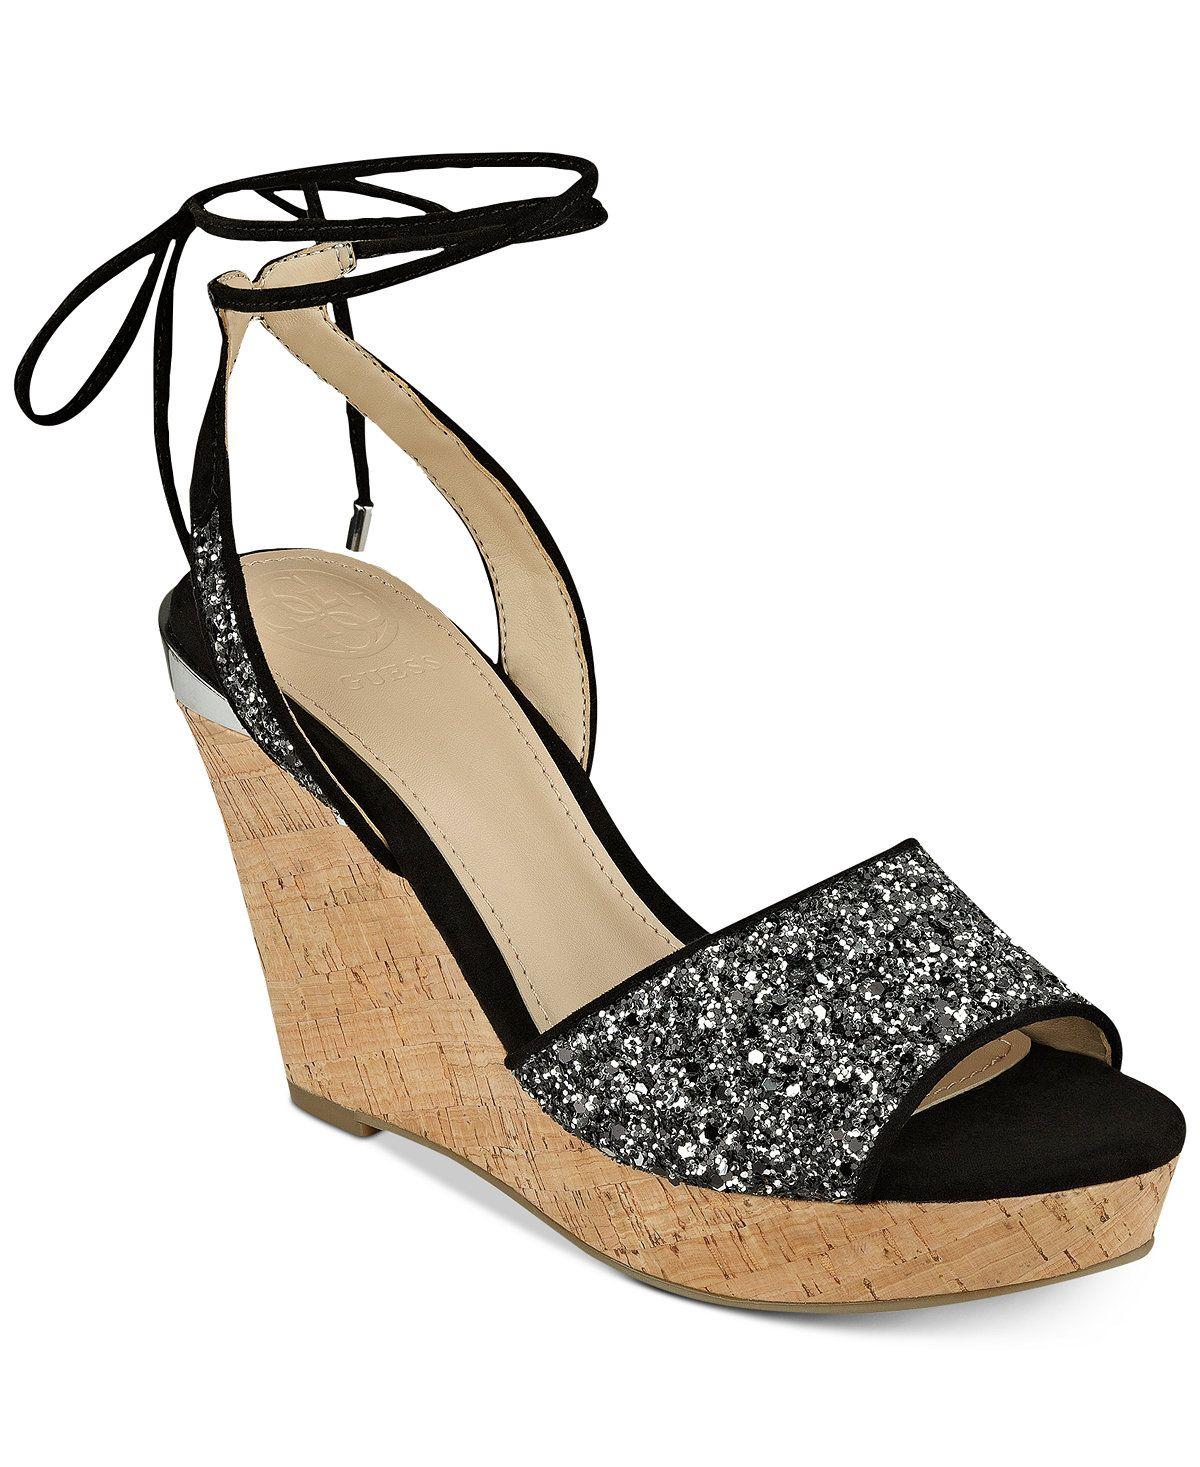 GUESS Women's Edinna Wedge Sandals - Sandals - Shoes - Macy's